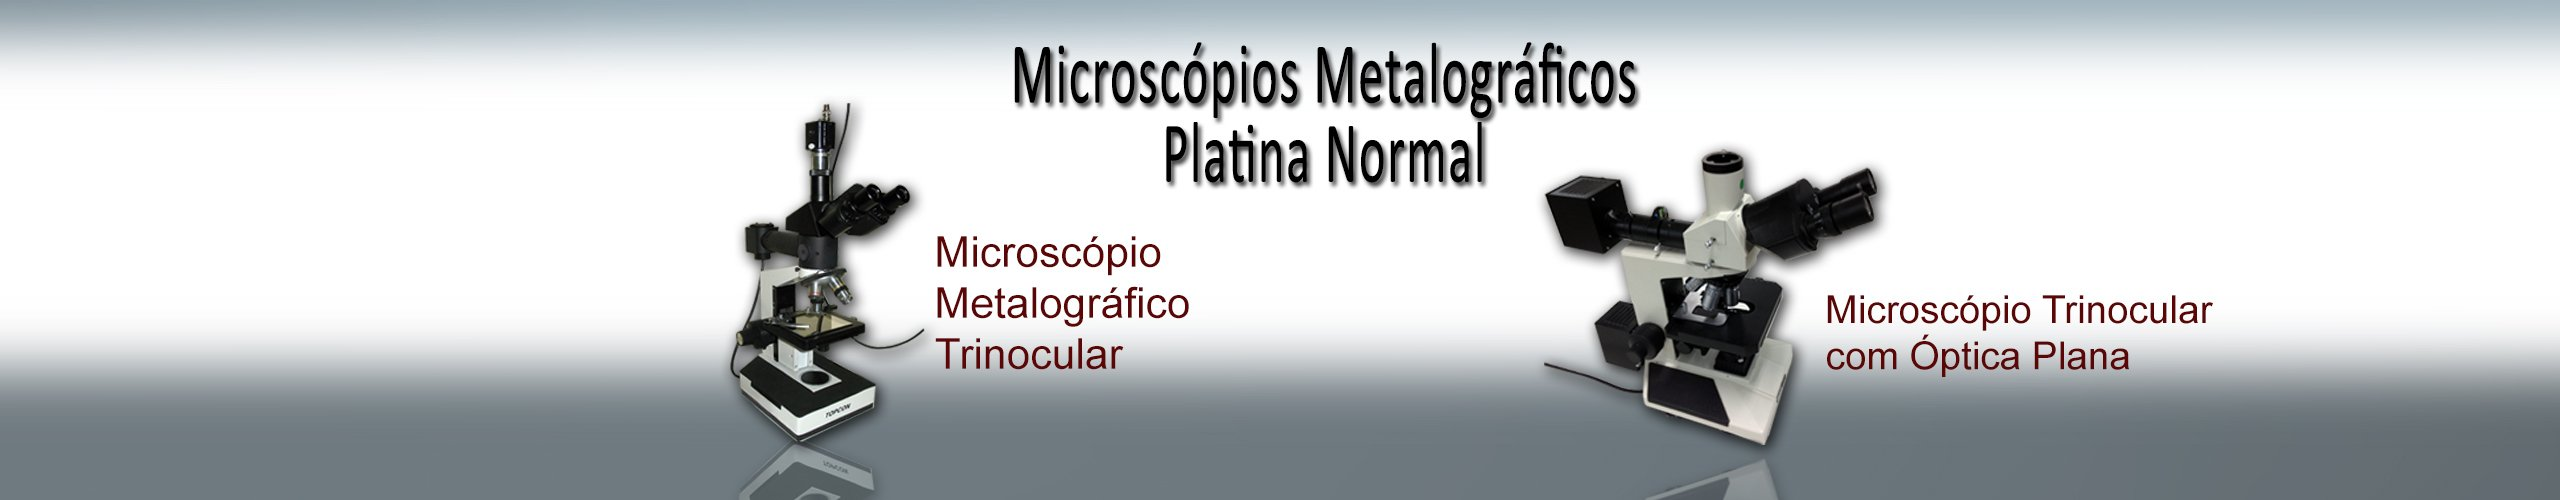 microscópio platina normal